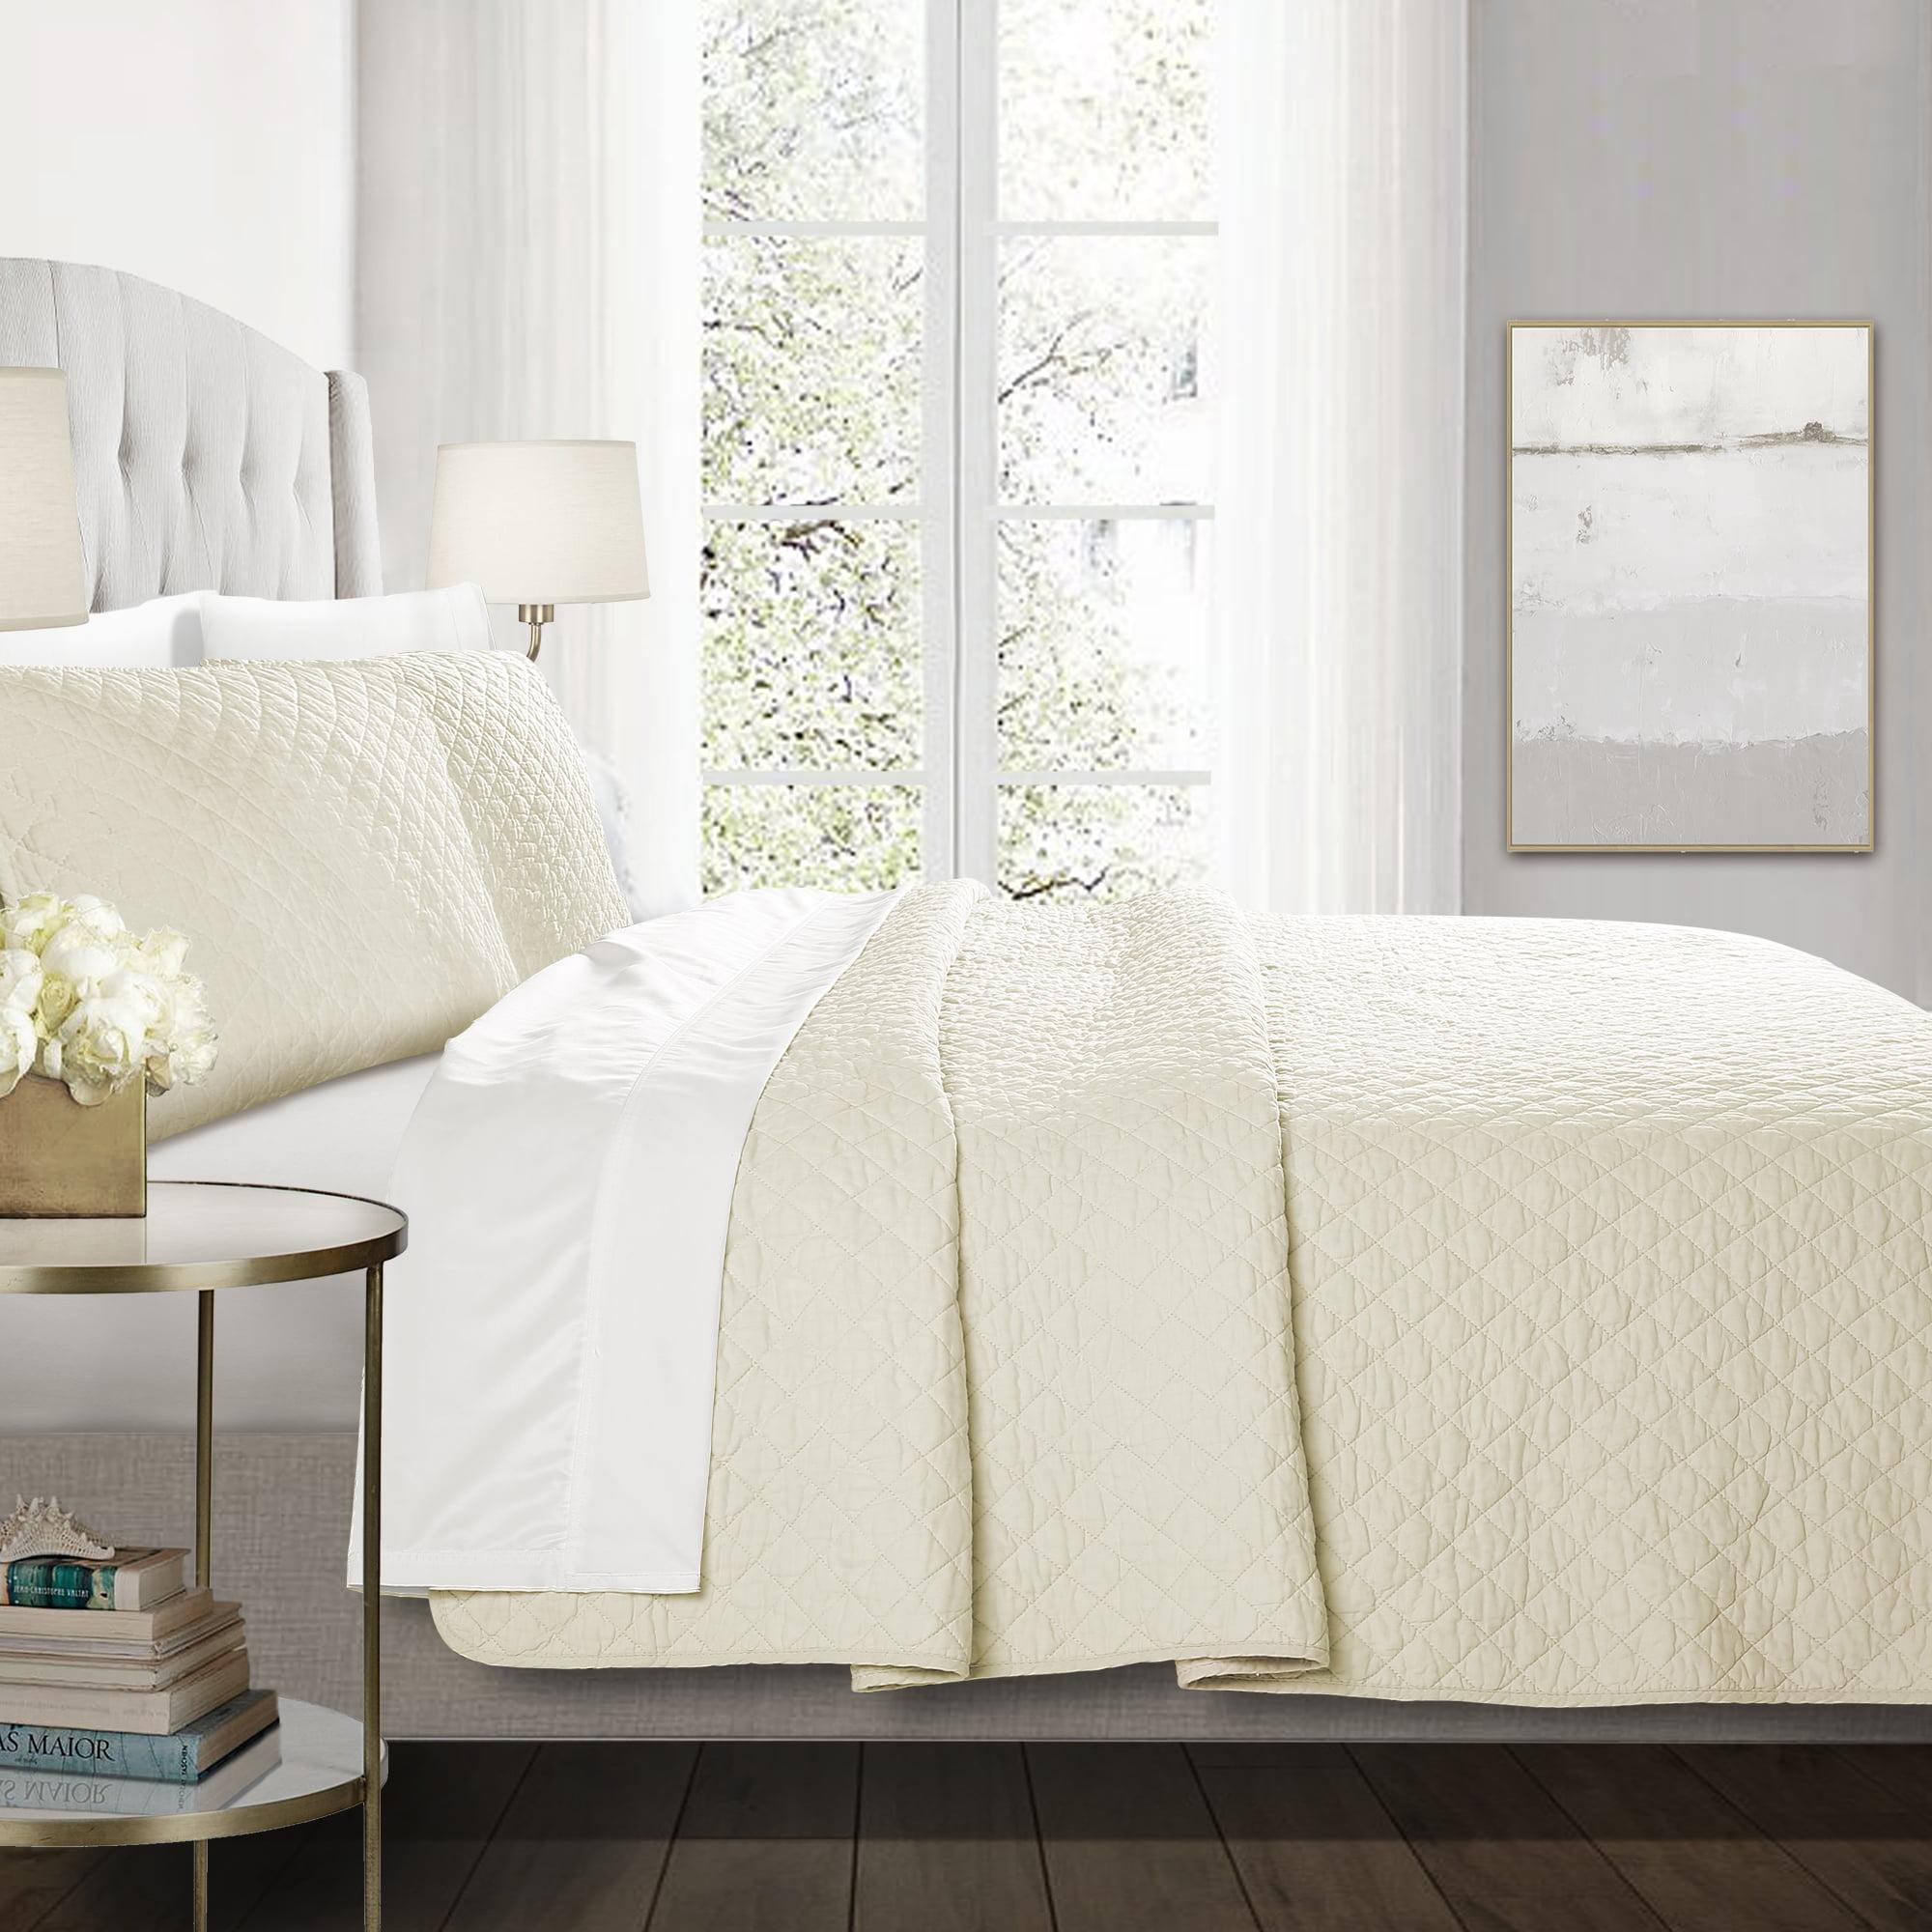 Ava Diamond Oversized Cotton Quilt 3pc Set